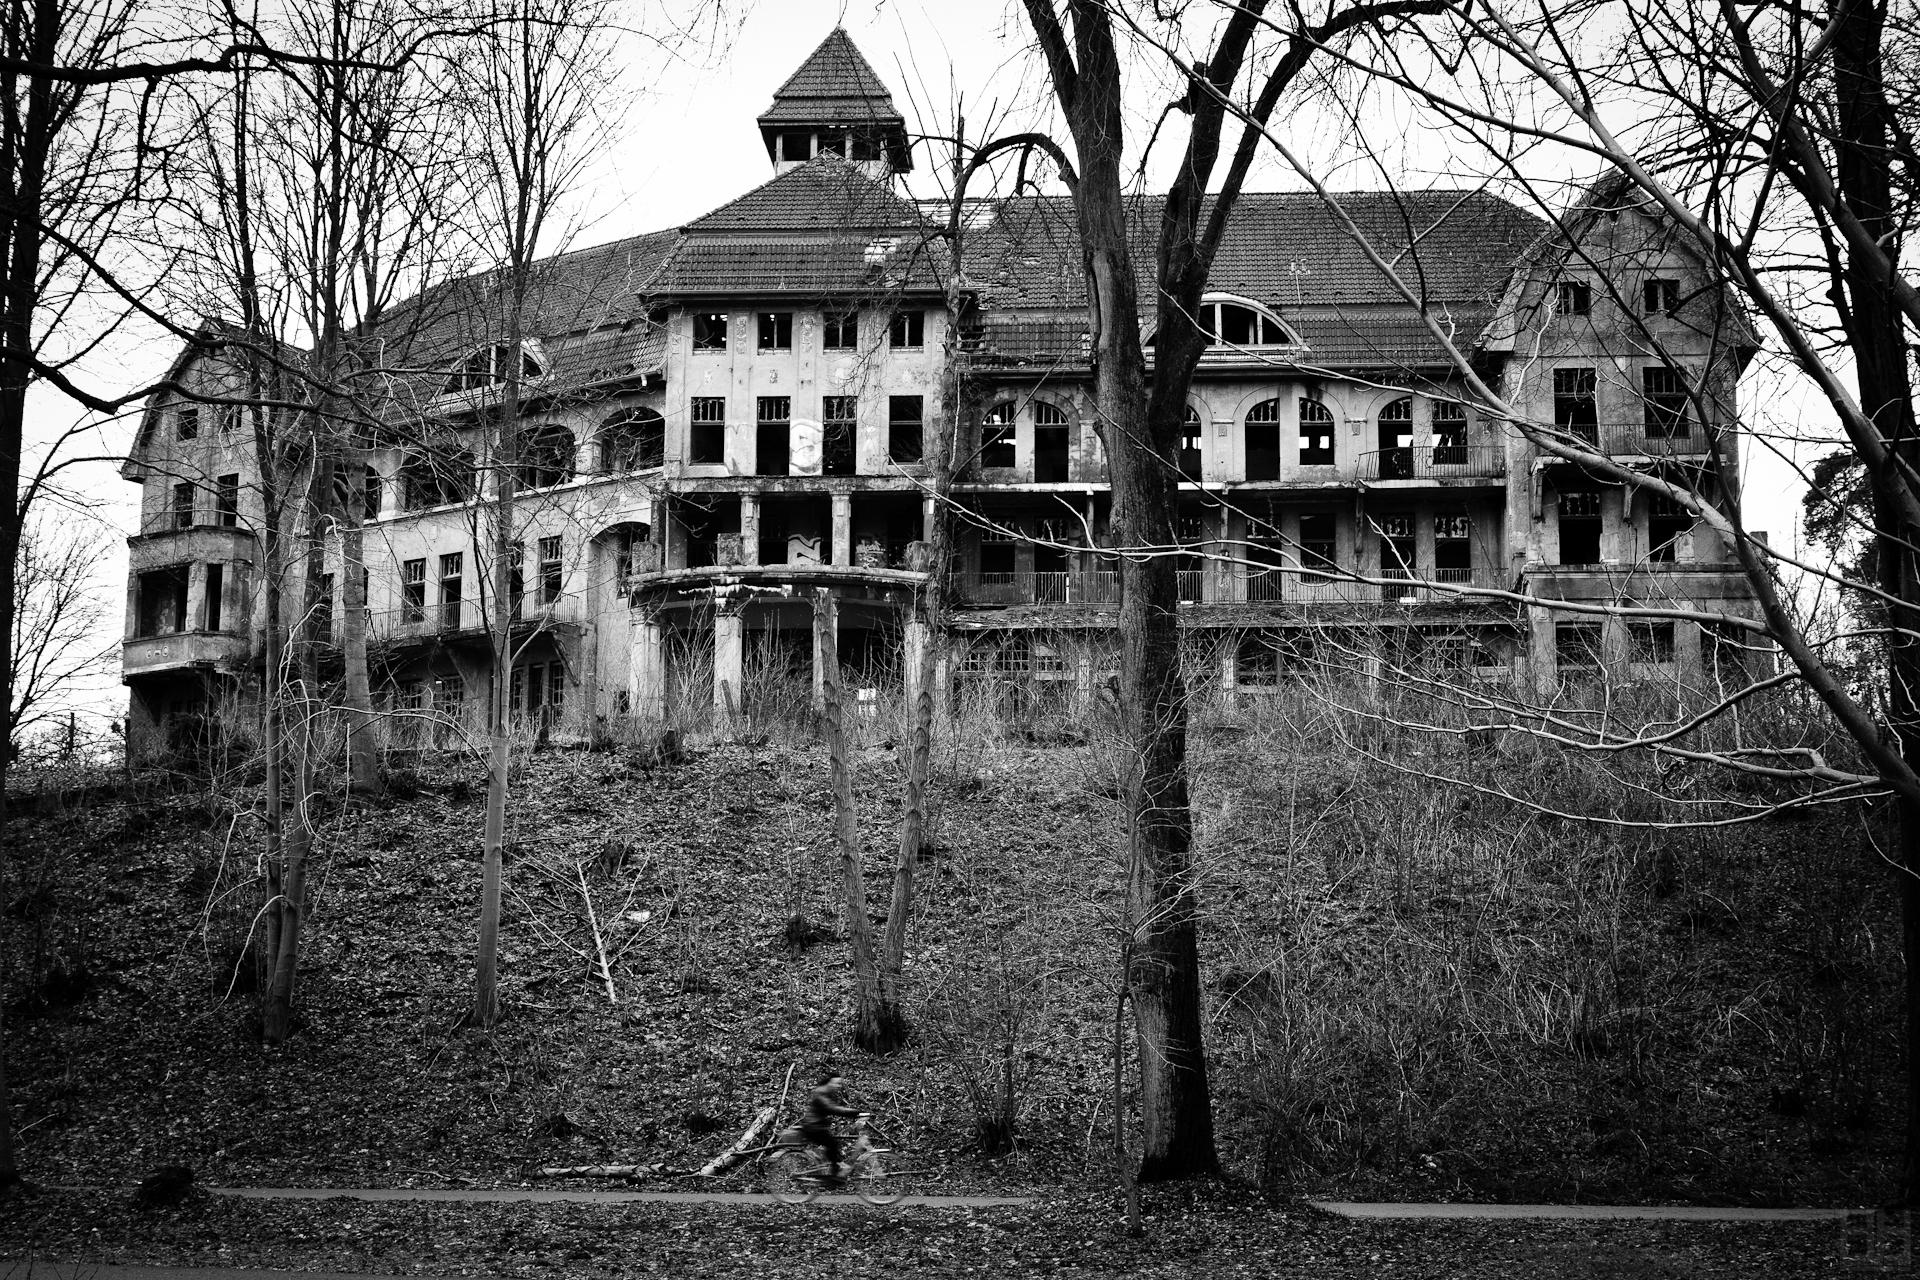 The Haunted House / Das Geisterhaus